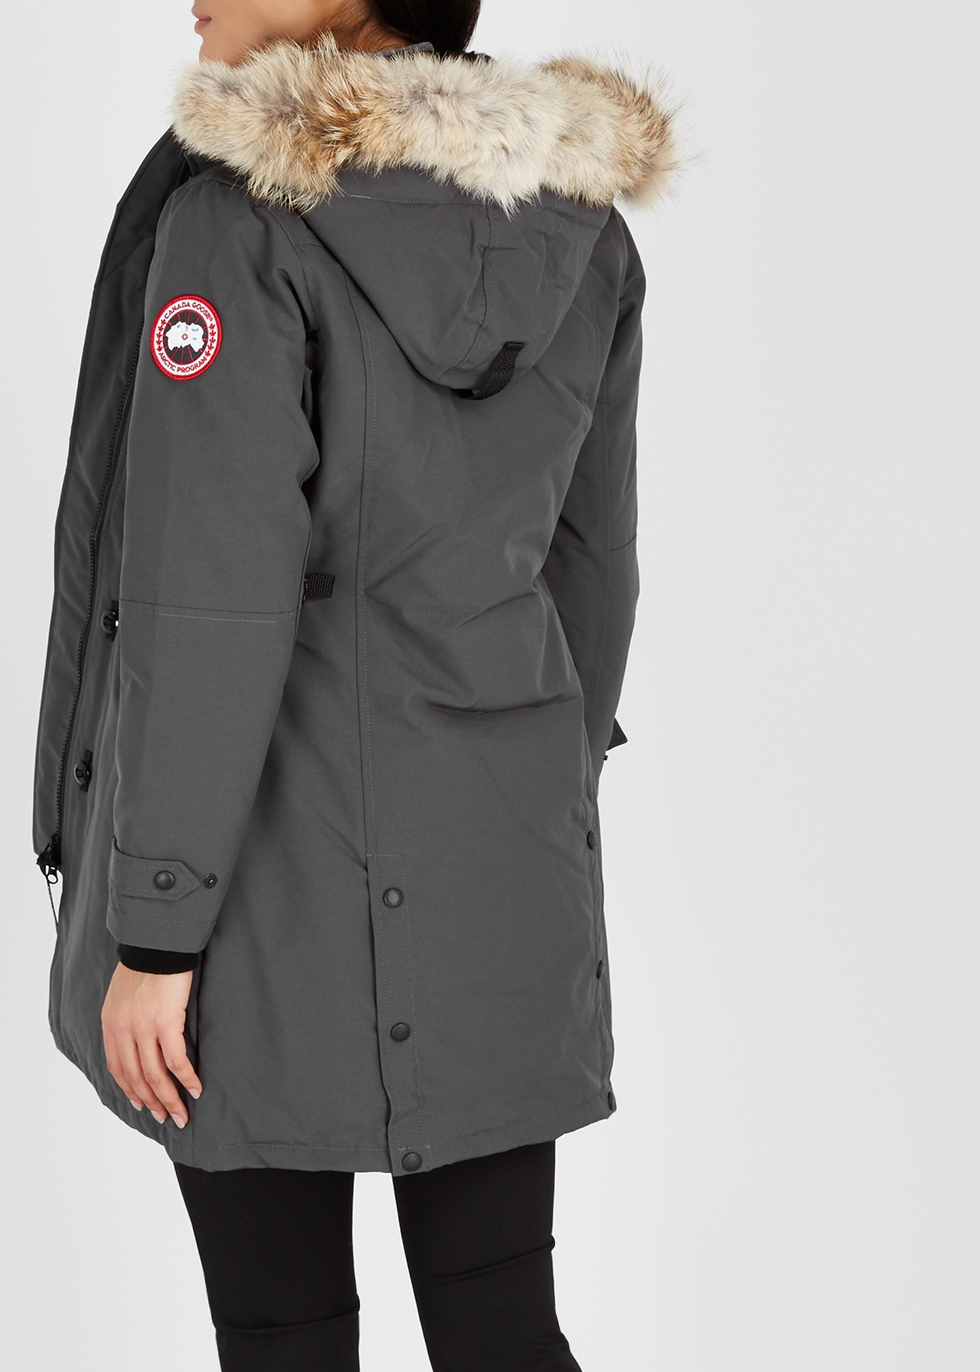 canada goose kensington fusion fit fur trimmed parka harvey nichols rh harveynichols com